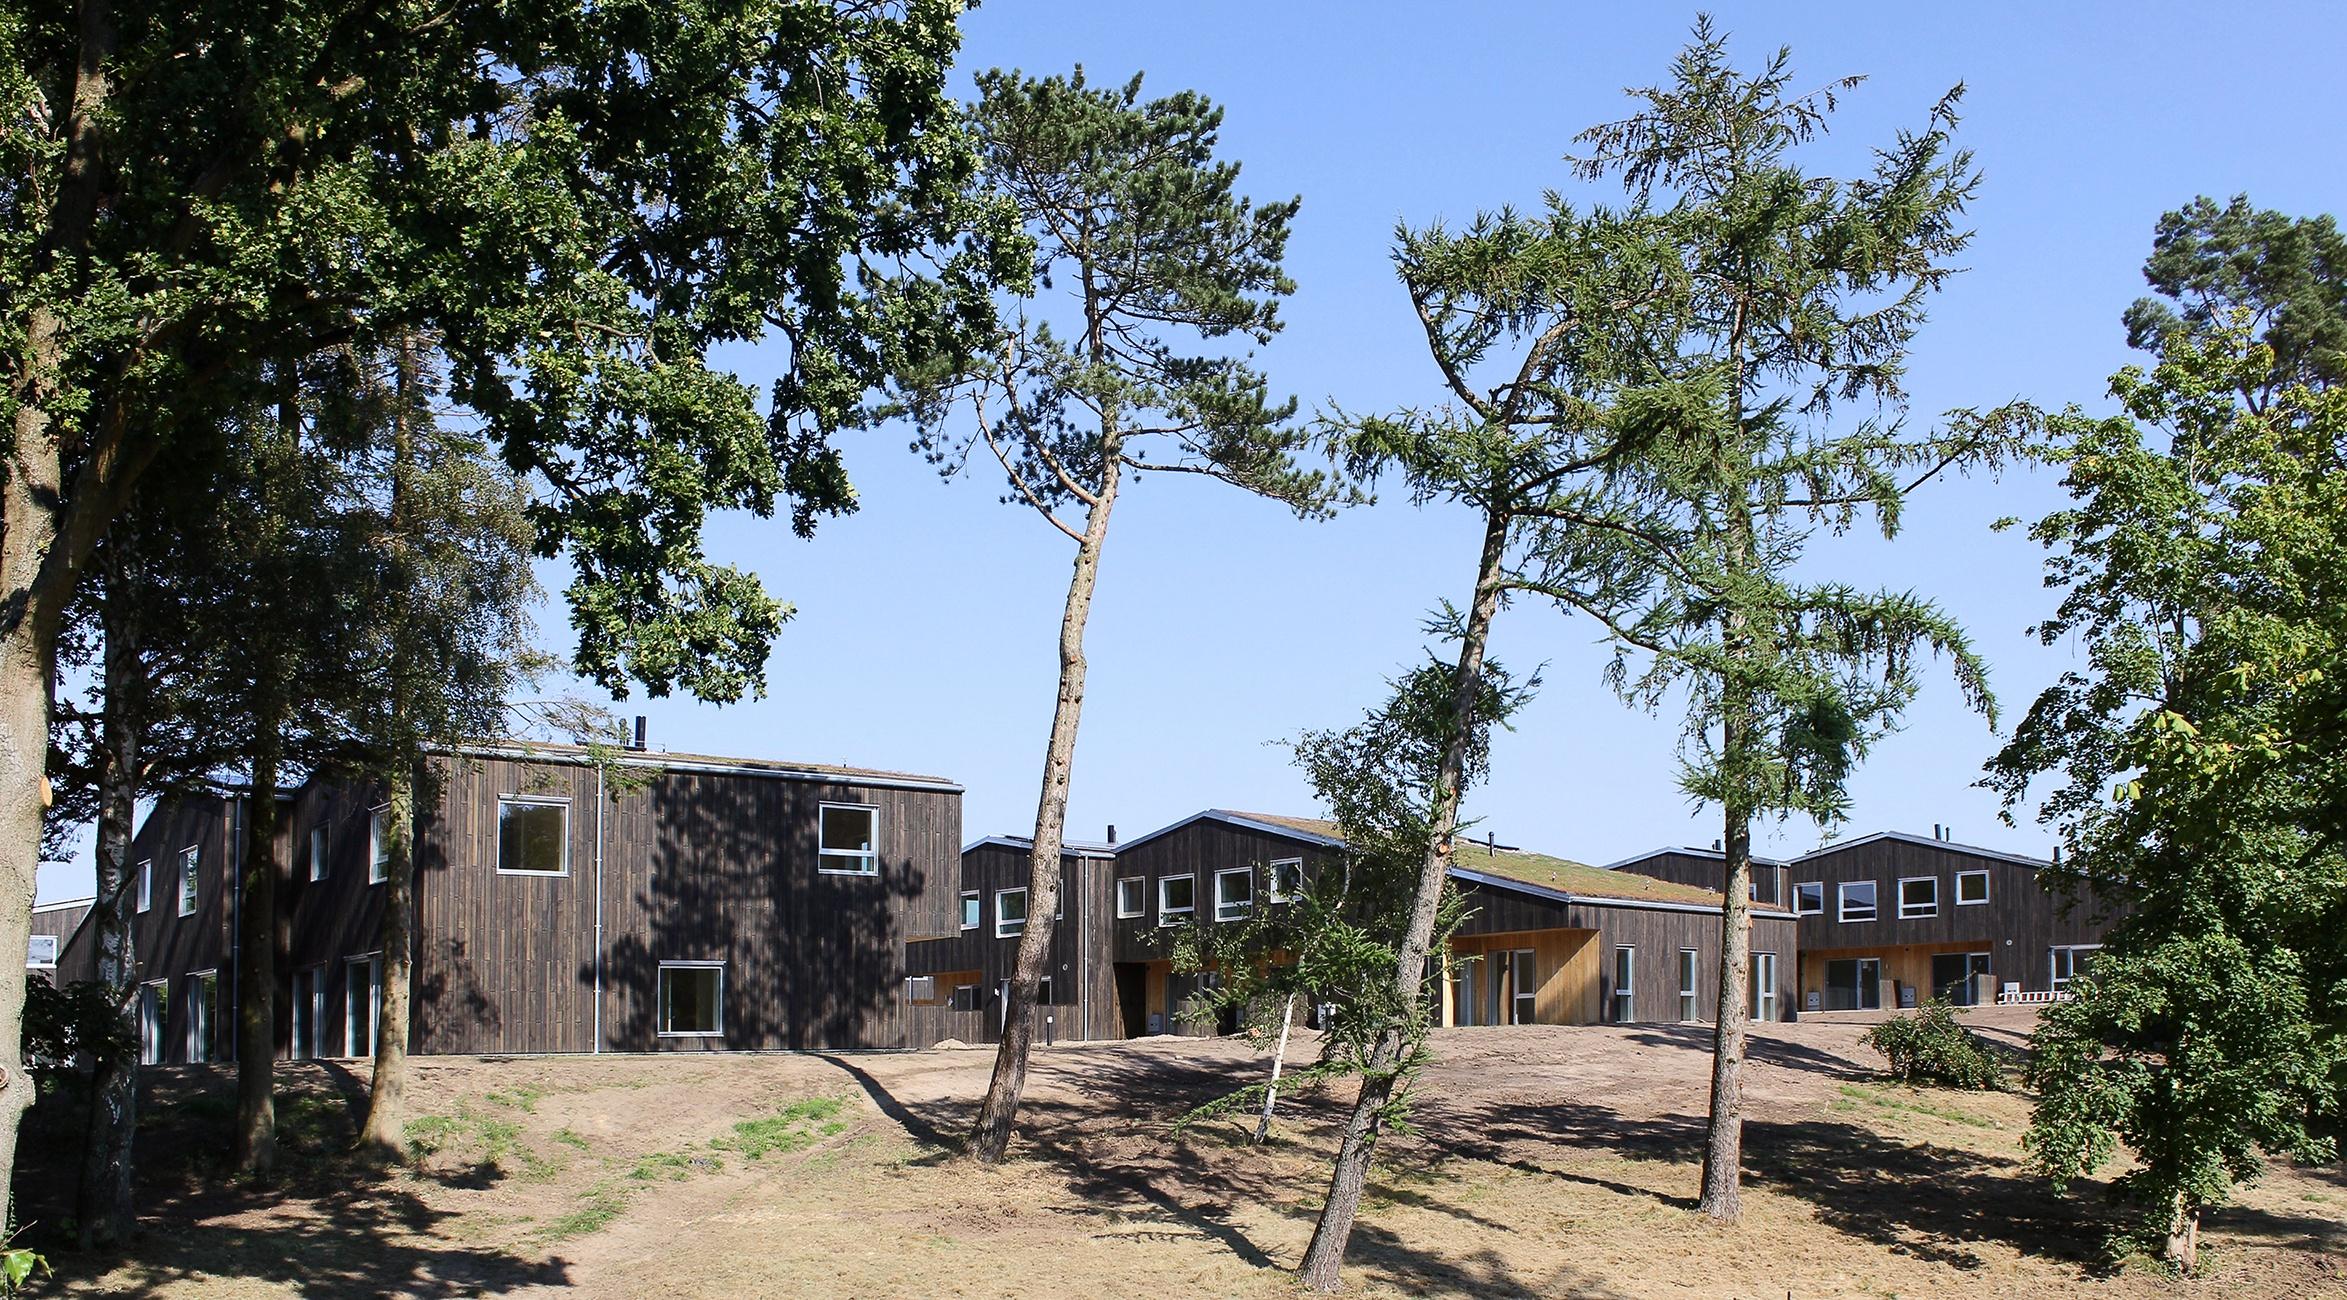 Tømmergården almen bolig plus ONV arkitekter Jyllinge